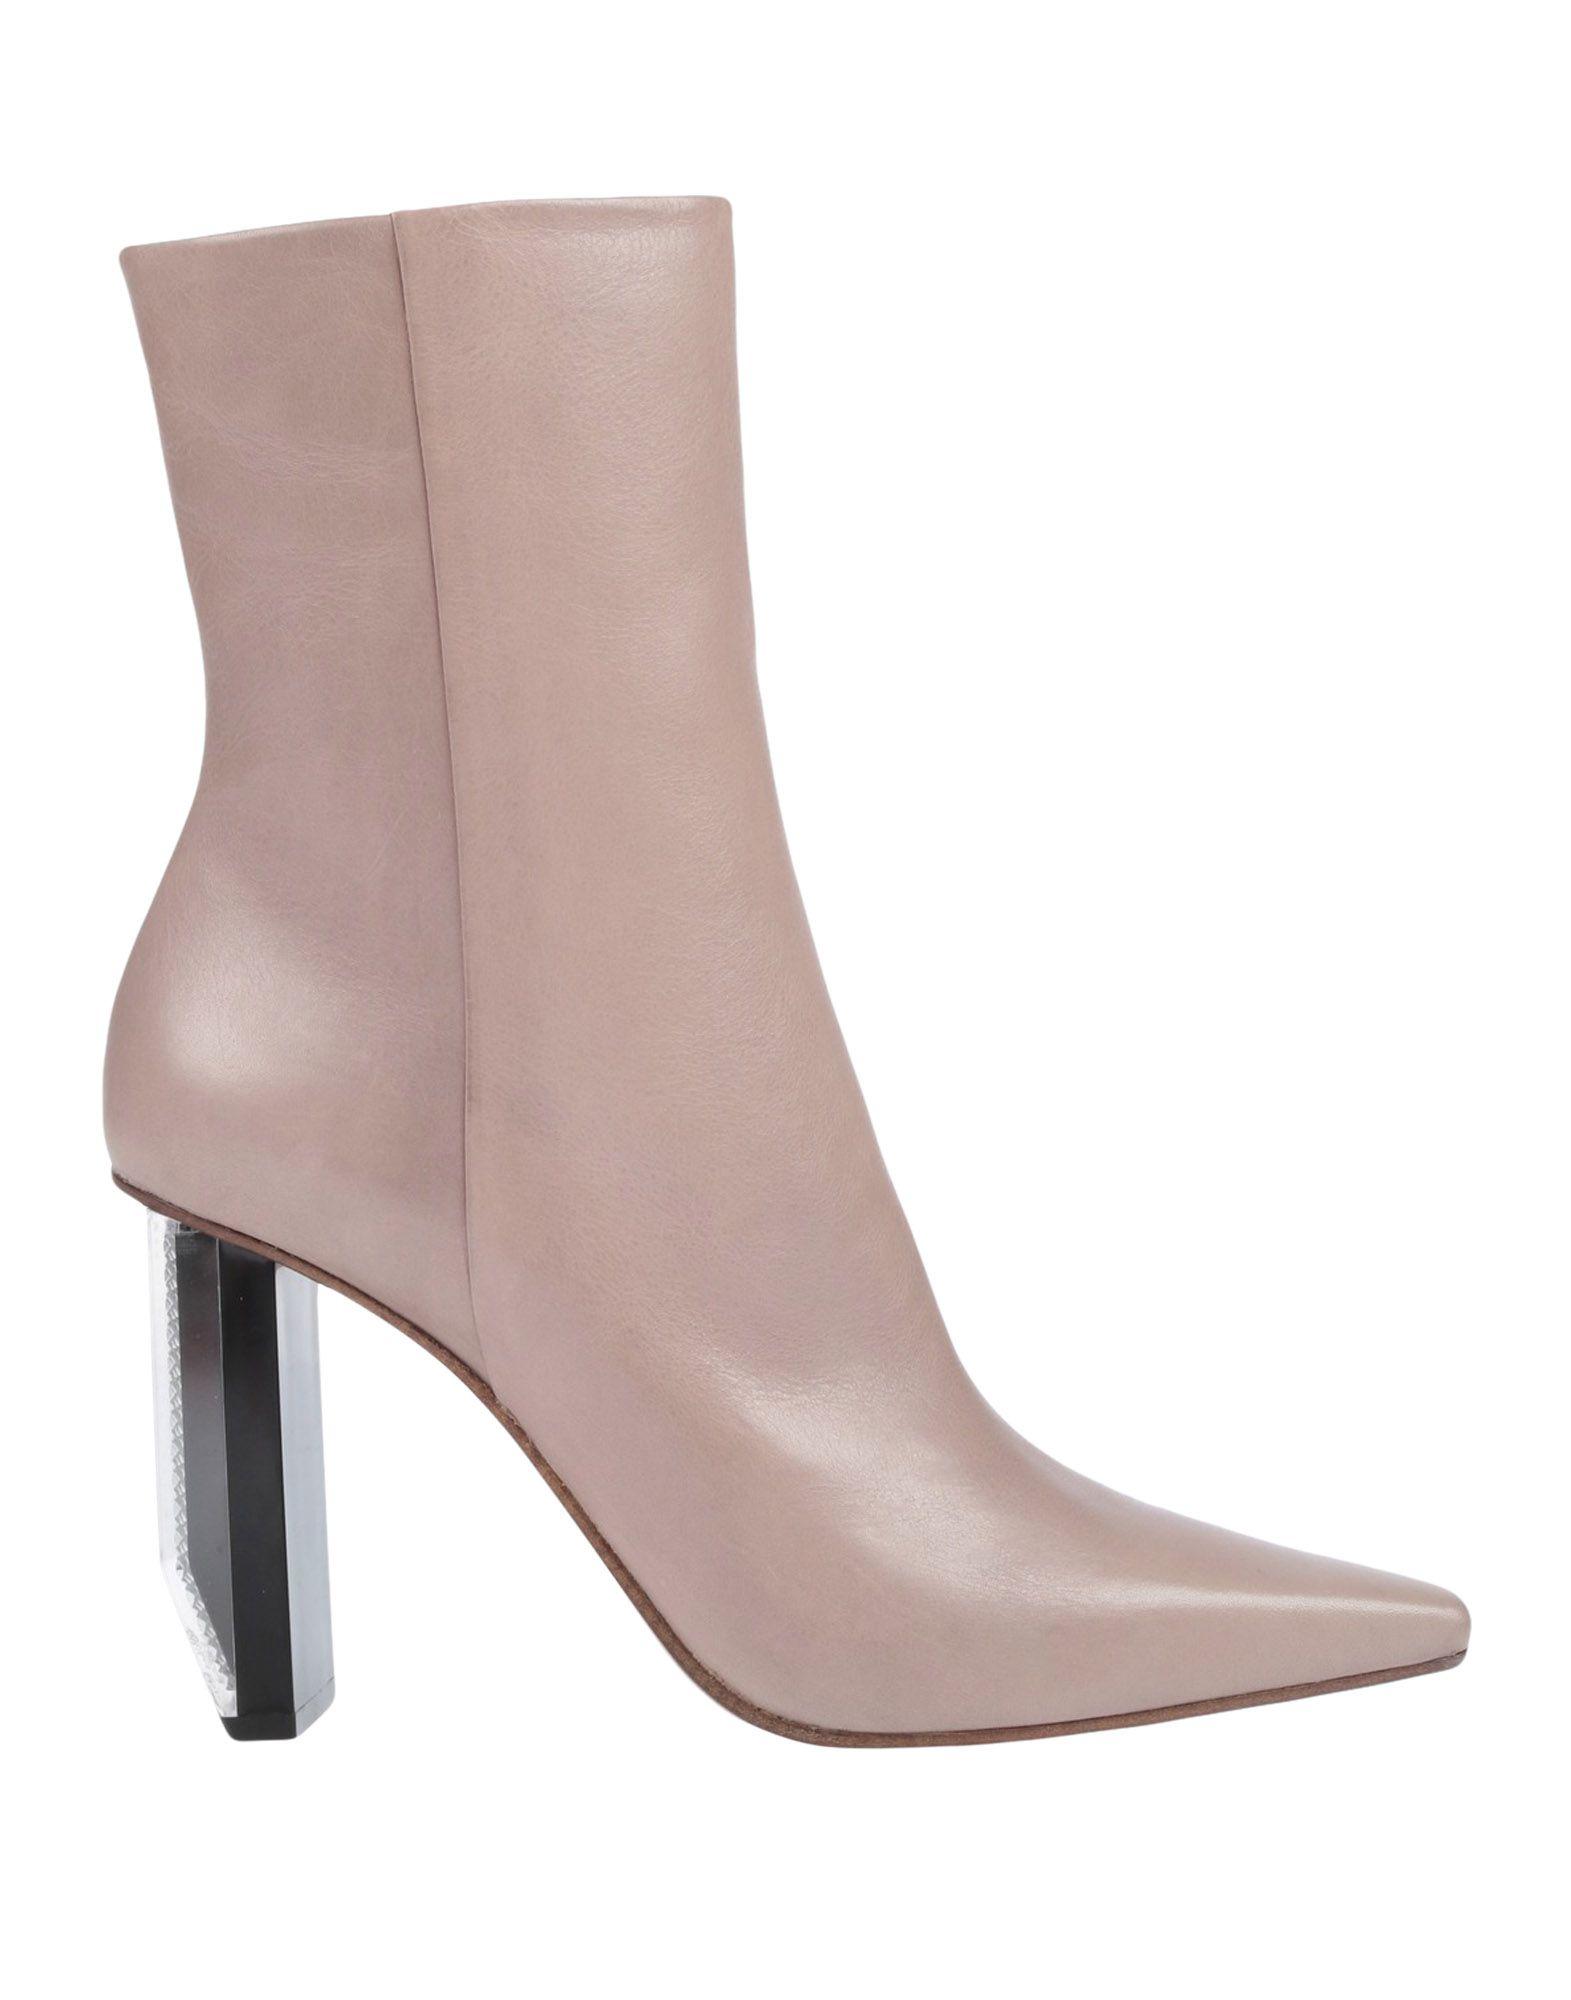 Vetements Ankle Boot - Women Vetements  Ankle Boots online on  Vetements Australia - 11536385II 539837